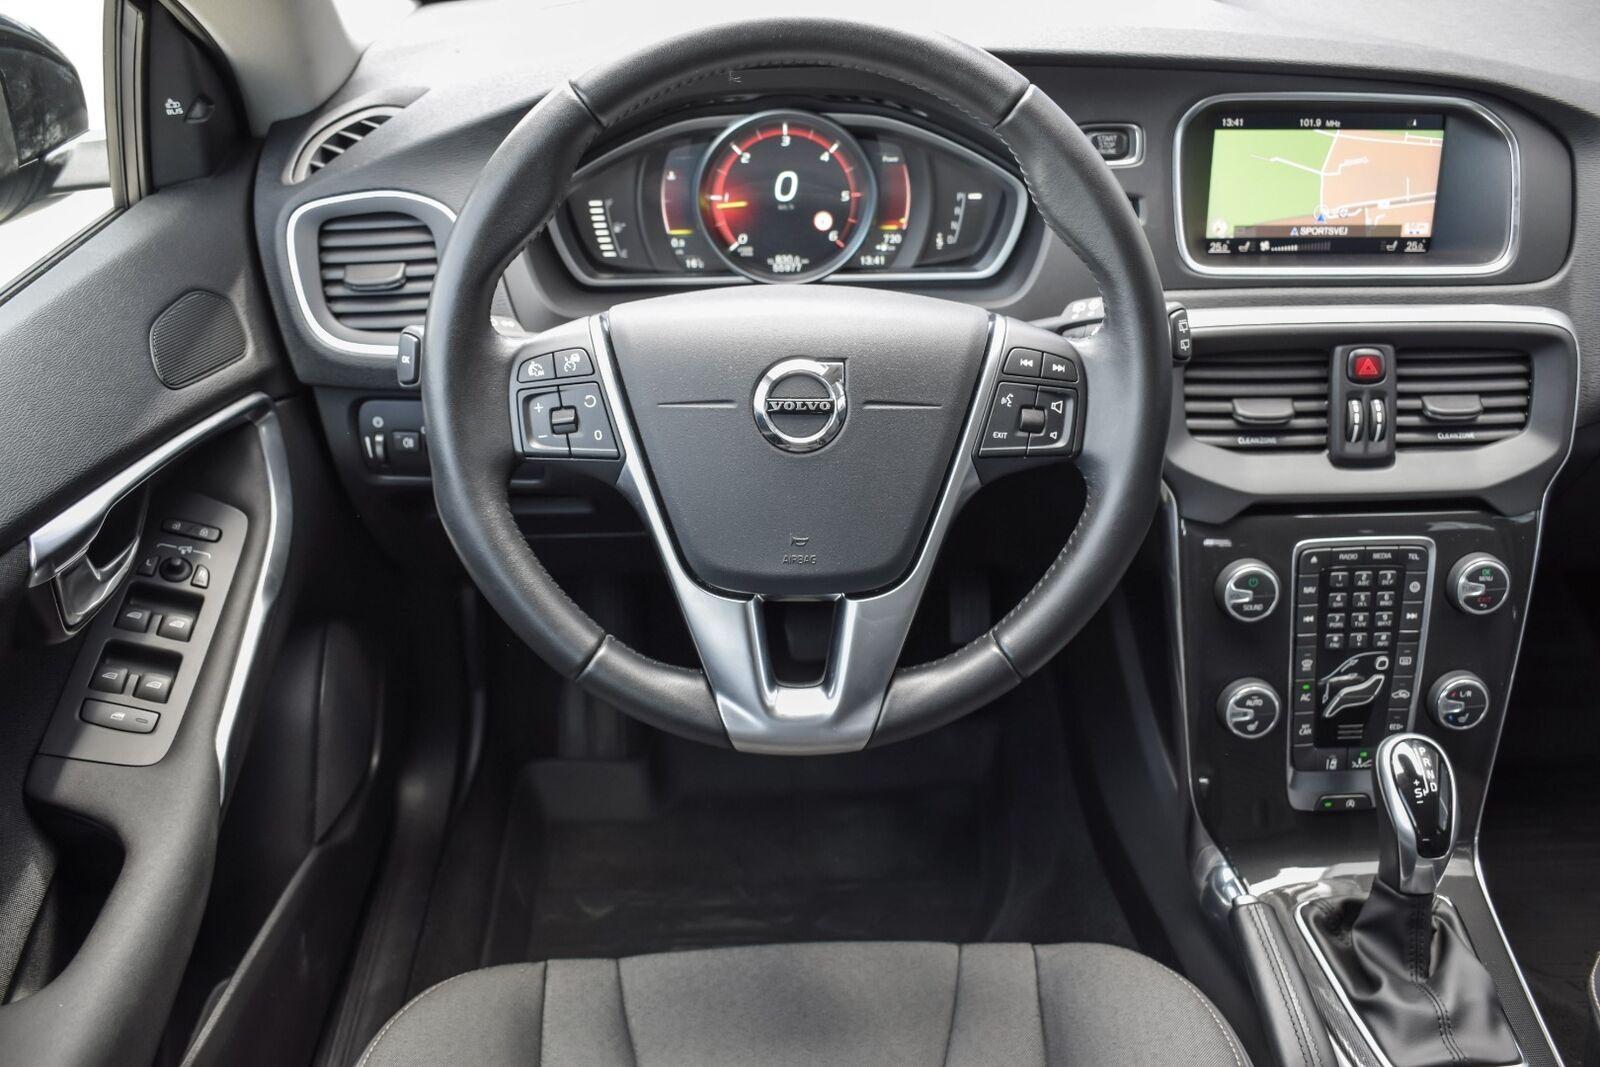 Volvo V40 CC 2,0 D2 120 Momentum aut. - billede 5